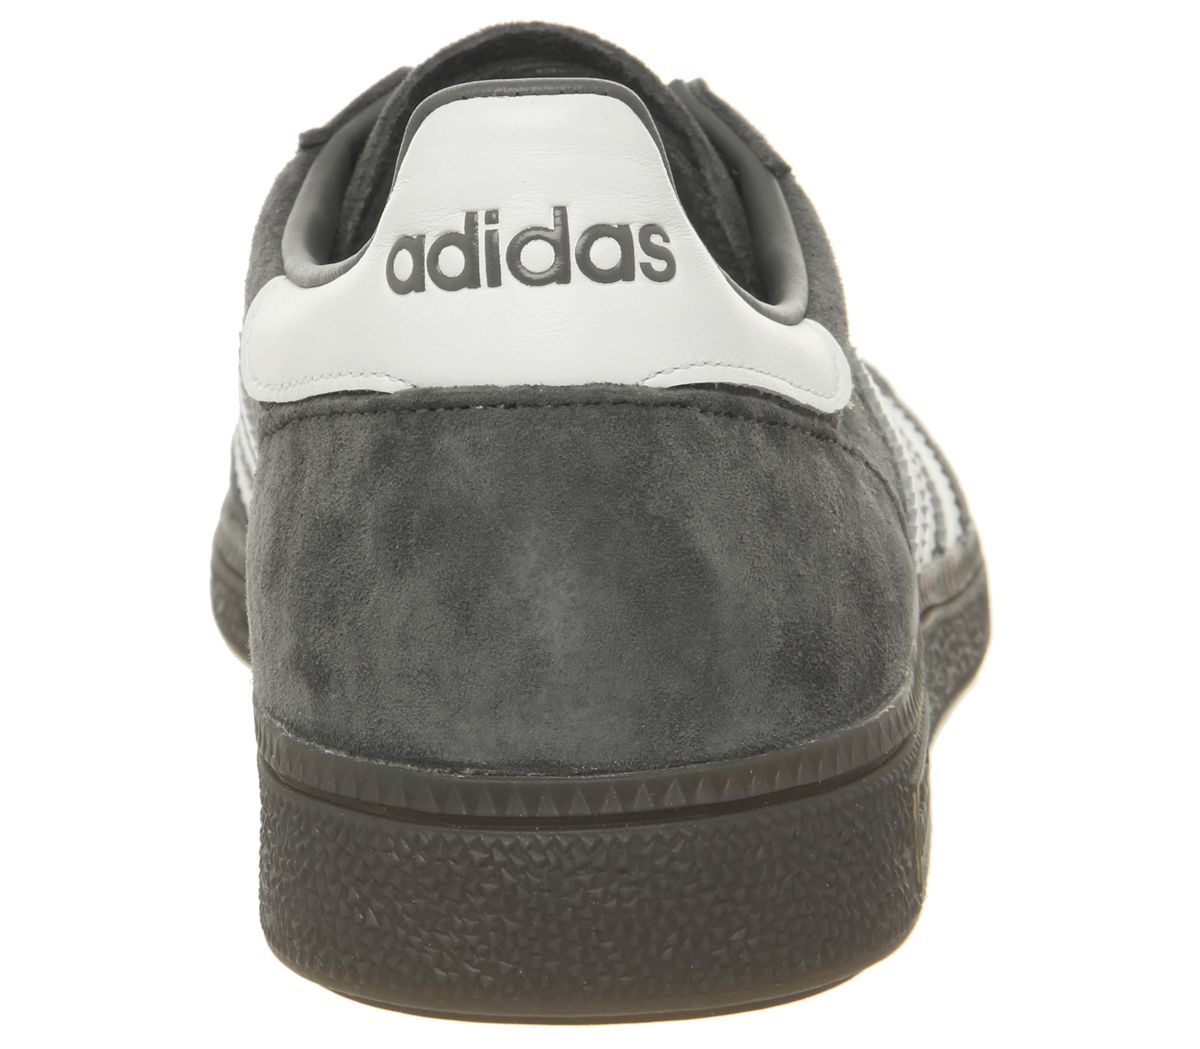 Details zu Adidas Handball Spezial Turnschuhe Grau Fünf Weiß Gummi Turnschuhe